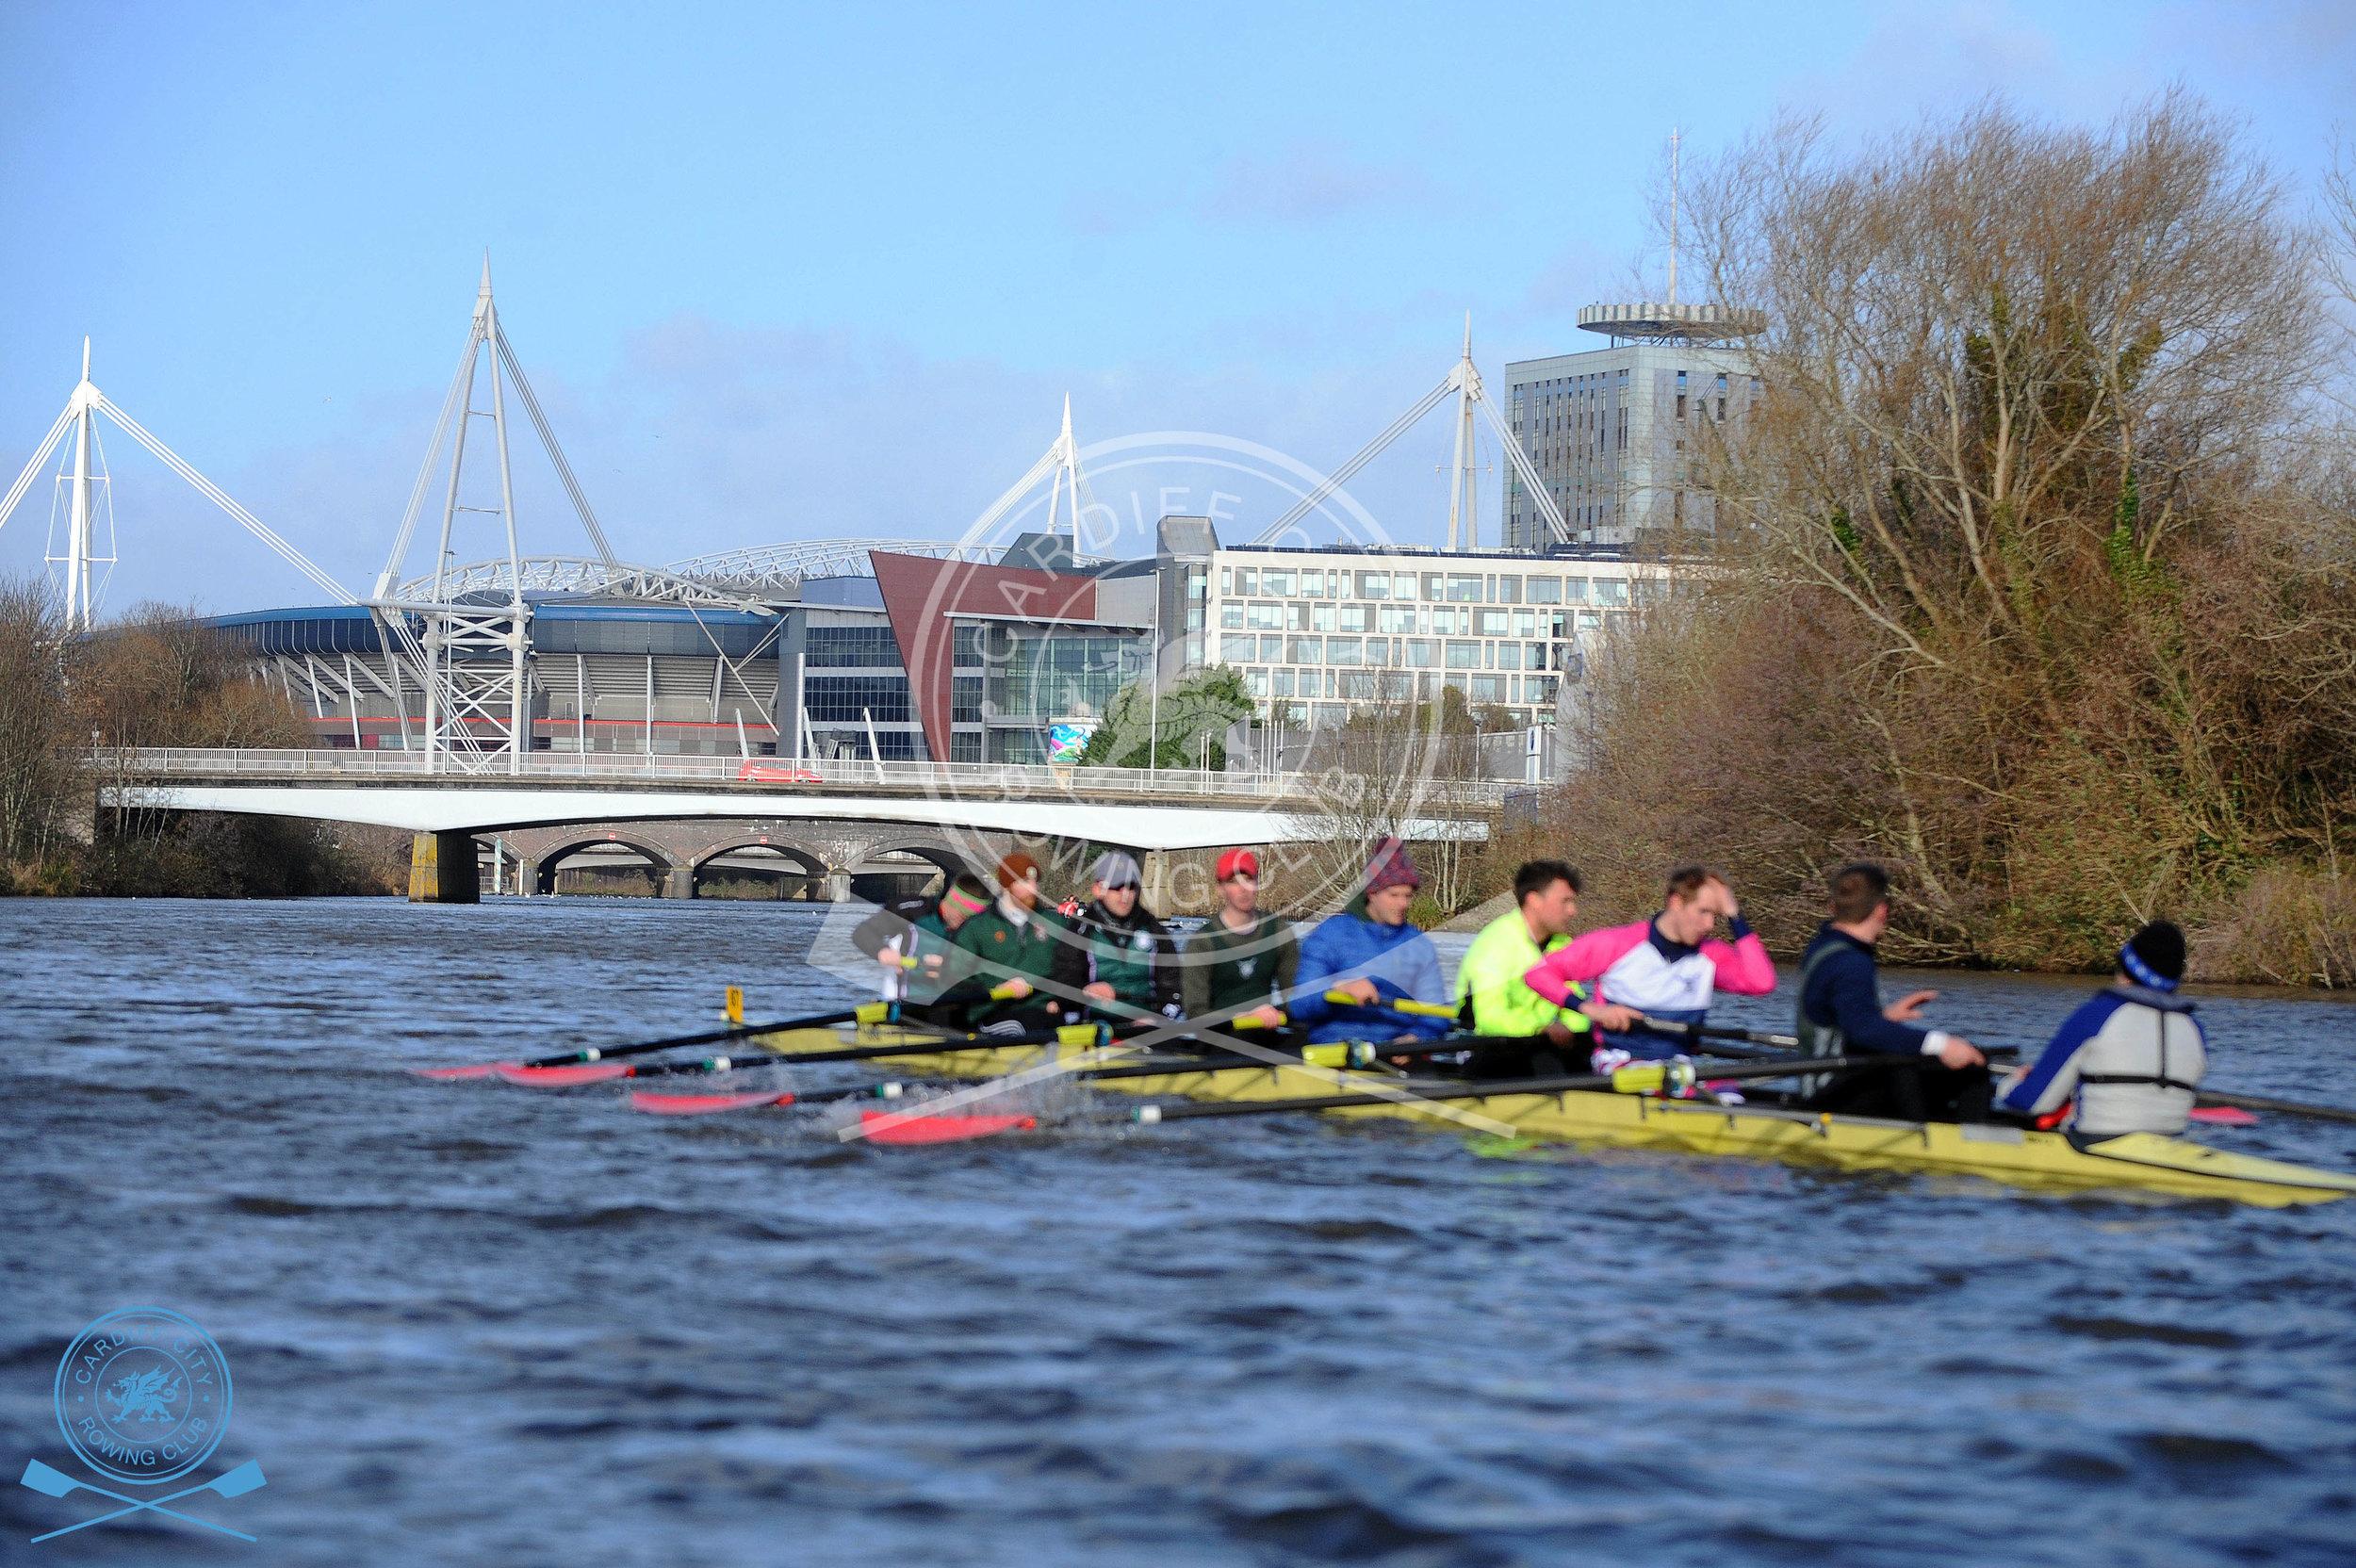 DW_280119_Cardiff_City_Rowing_335.jpg